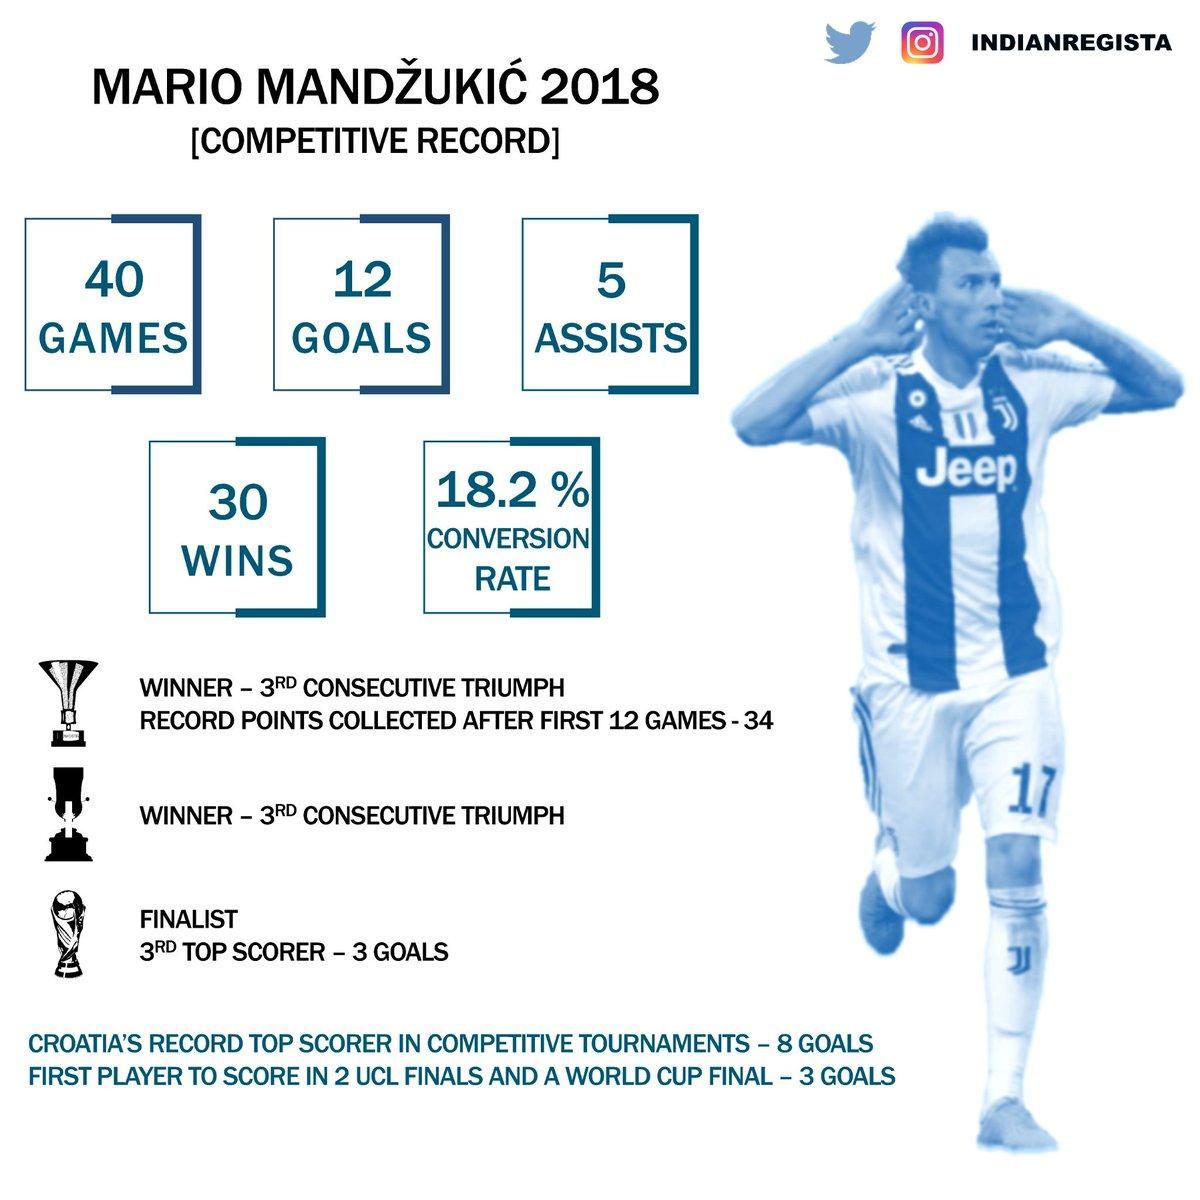 2️⃣ 0️⃣ 1️⃣ 8️⃣ Čestitke, @MarioMandzukic9 se upisao u povijest. // What a historic year for our Super Mario Mandžukić. #BallondOr #BallondOr2018